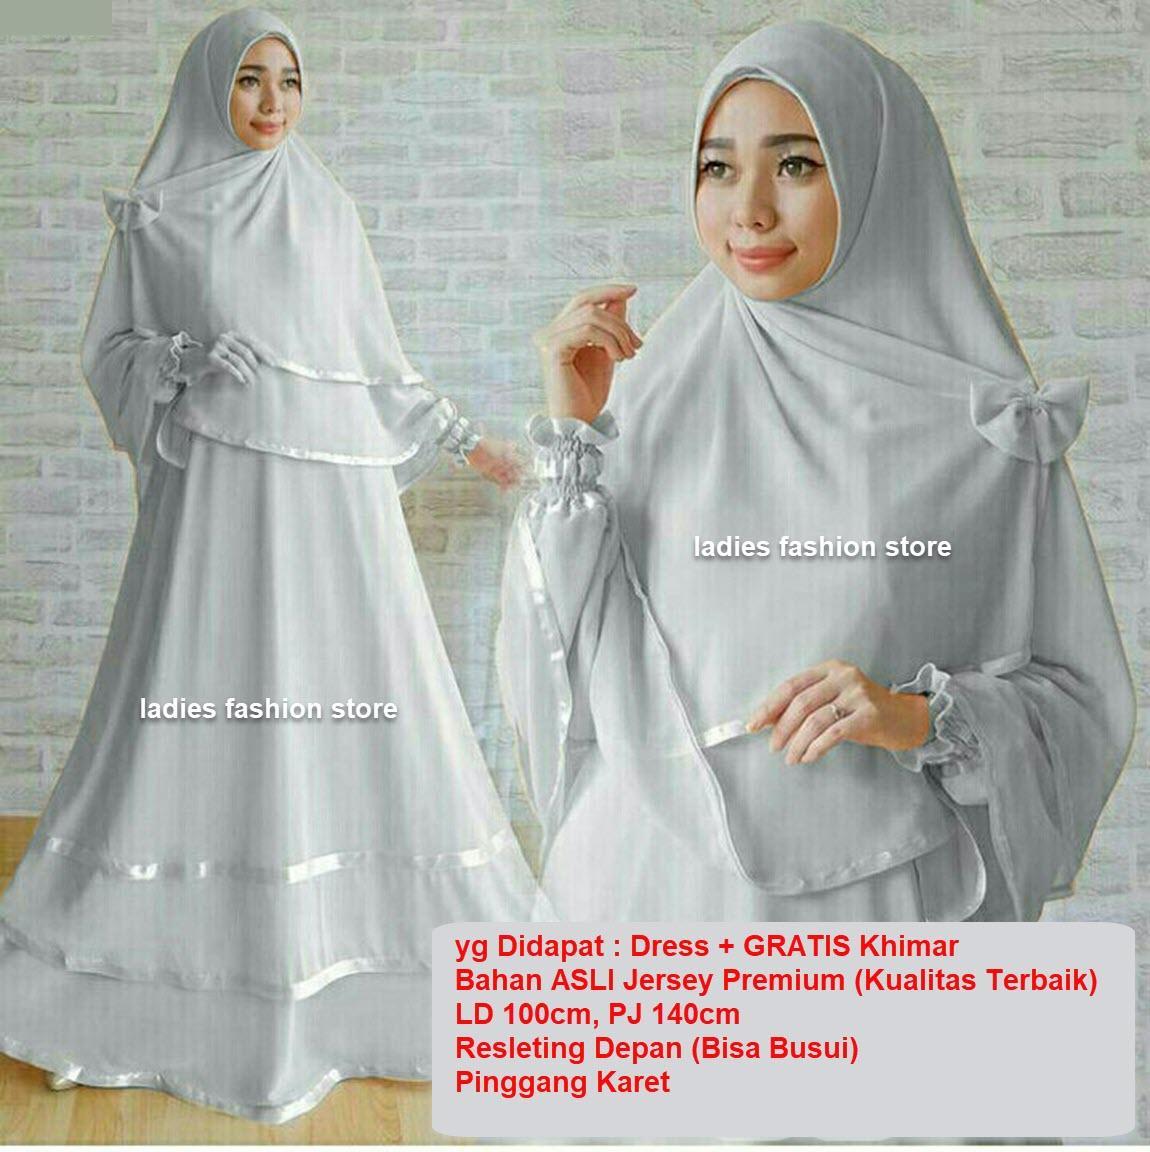 419b1672f40f185d5bdb1084f807763d Ulasan List Harga Long Dress Elegant Muslim Paling Baru minggu ini